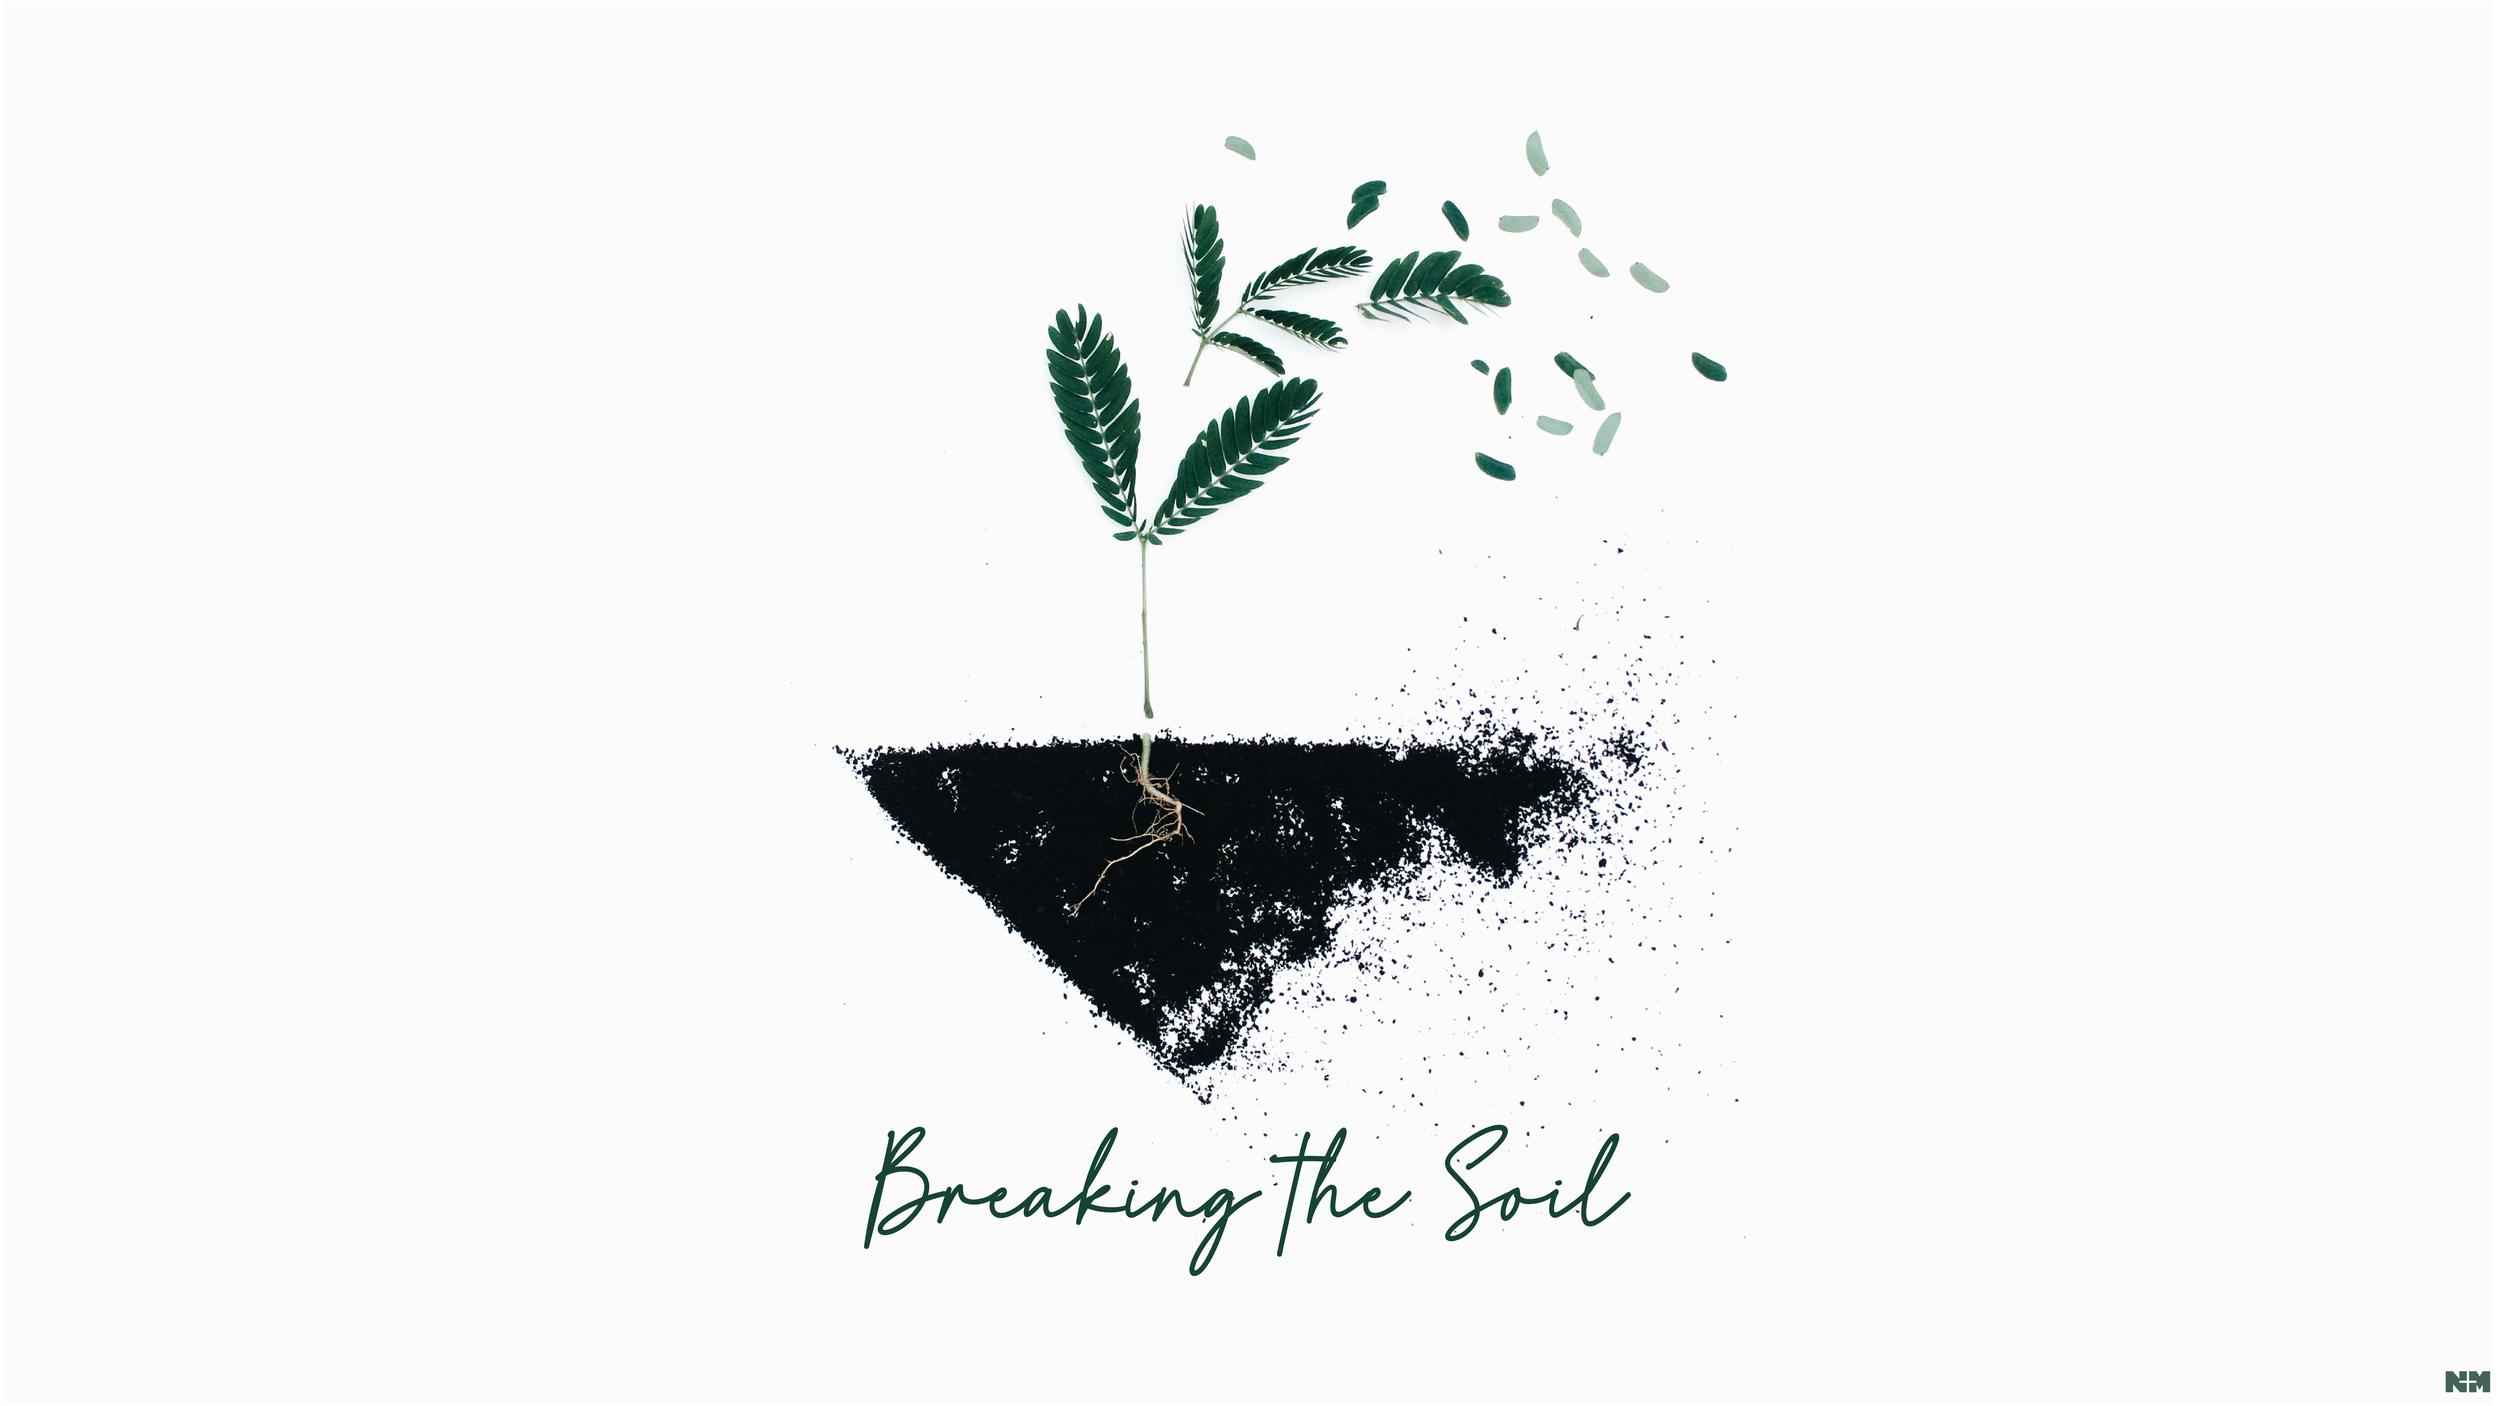 20190201_SermonSeries_BreakingtheSoil-01.png